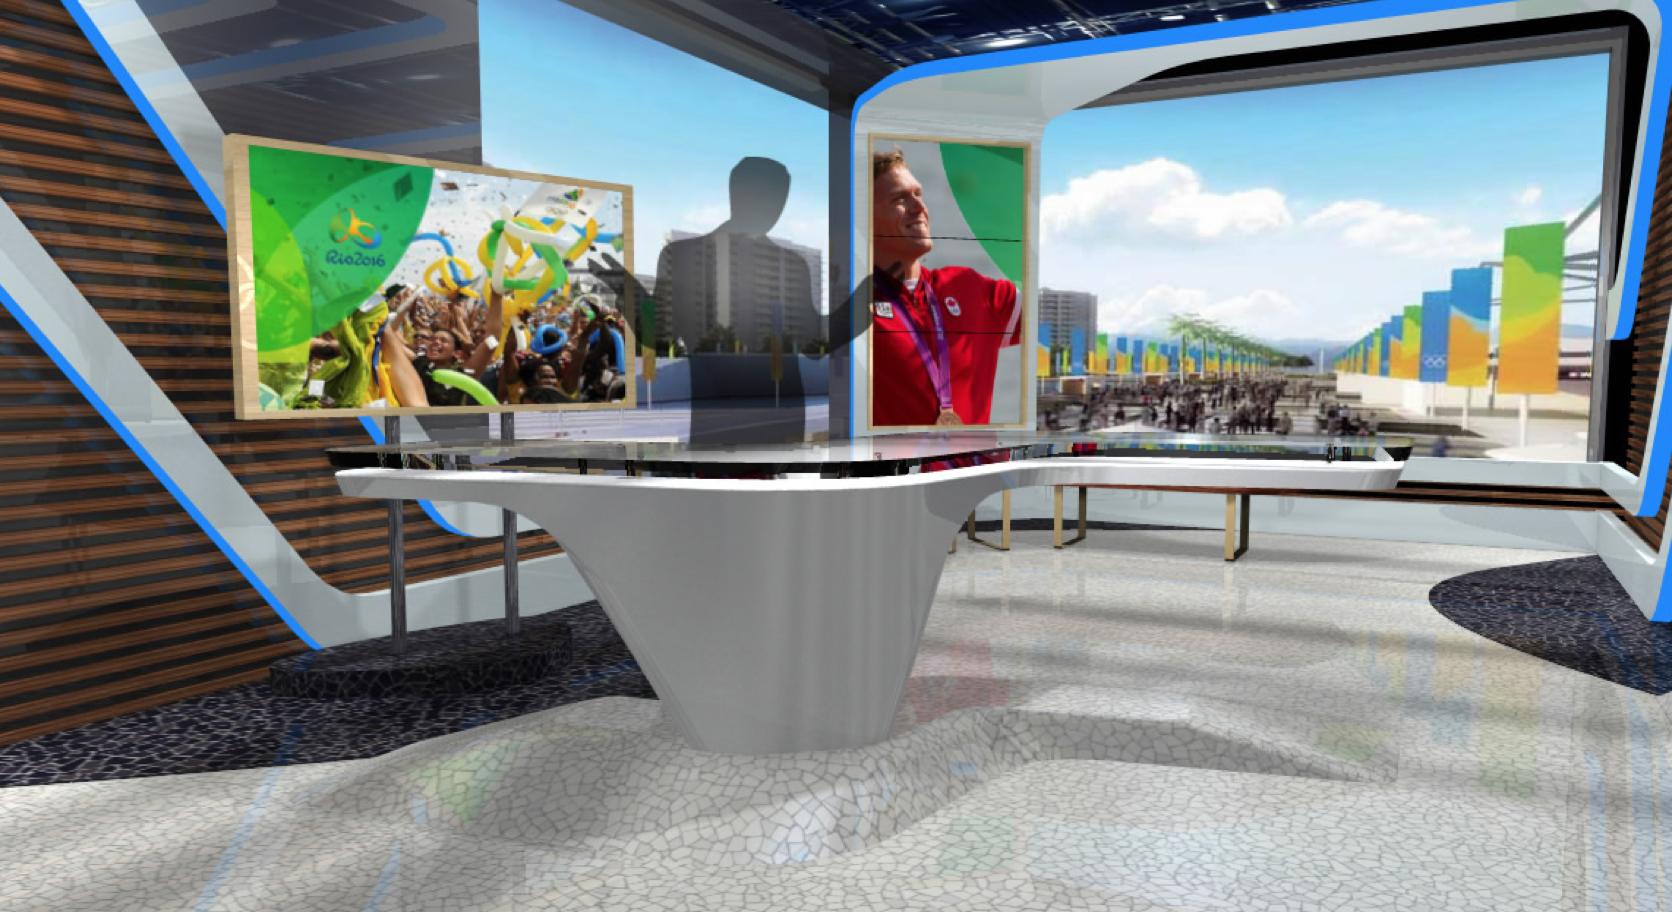 ncs_CBC-Rio-Olympics-TV-Studio_0012